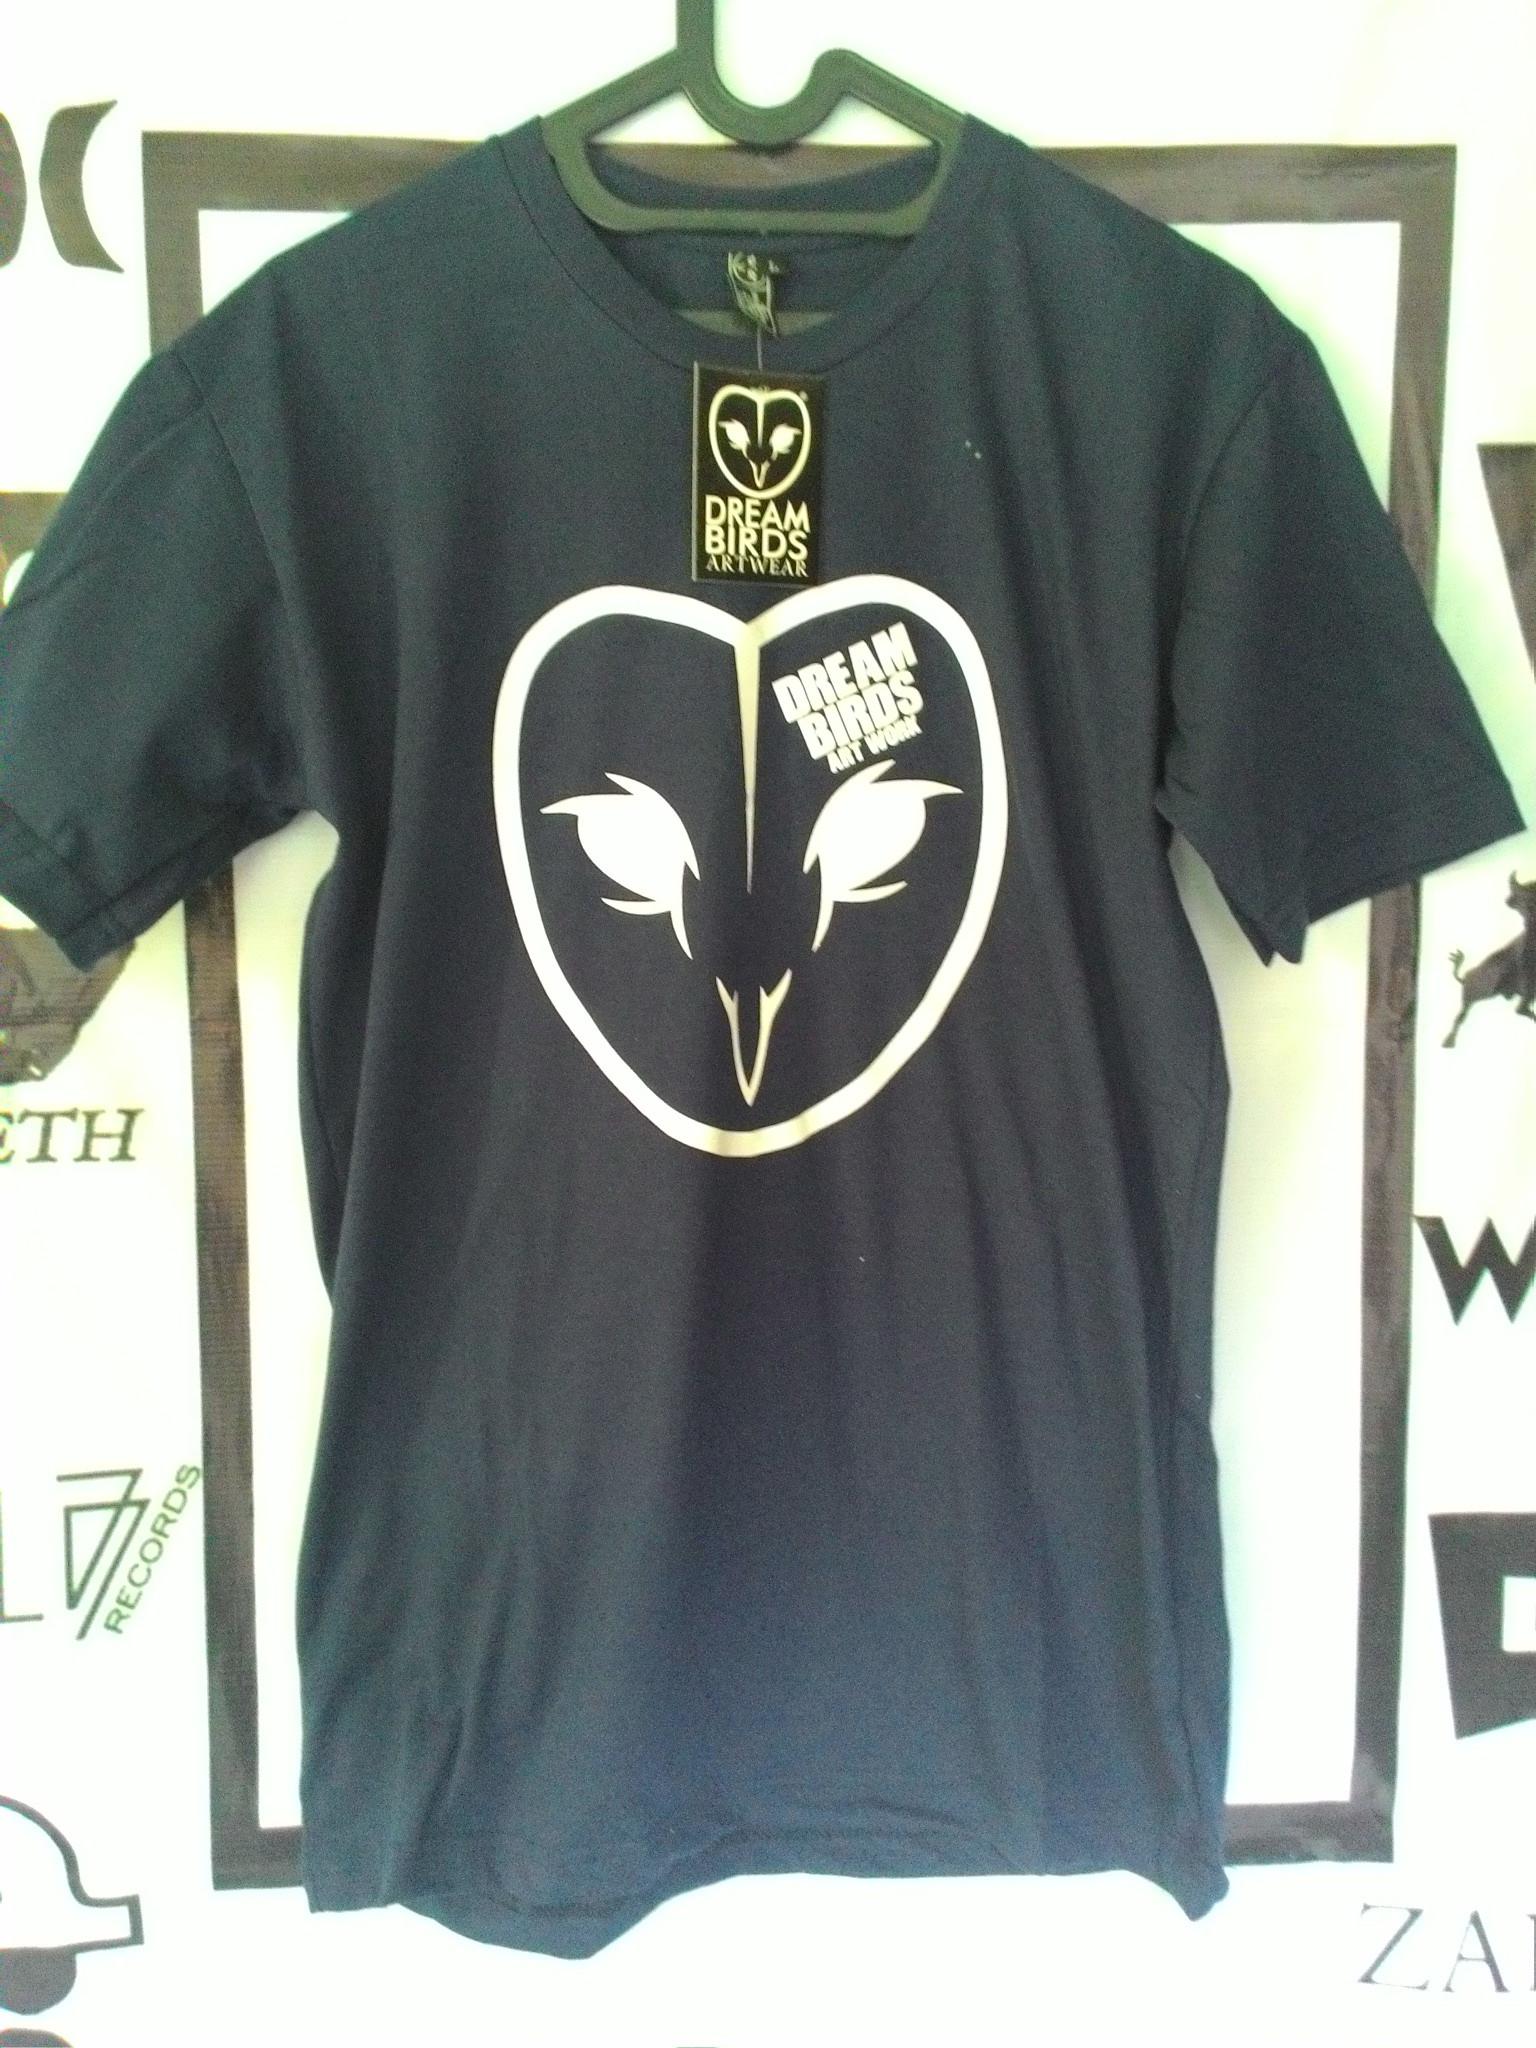 Jual baju kaos distro dreambird owl hitam dan putih jpg 1536x2048 Gambar baju  kaos putih hitam 976b171929